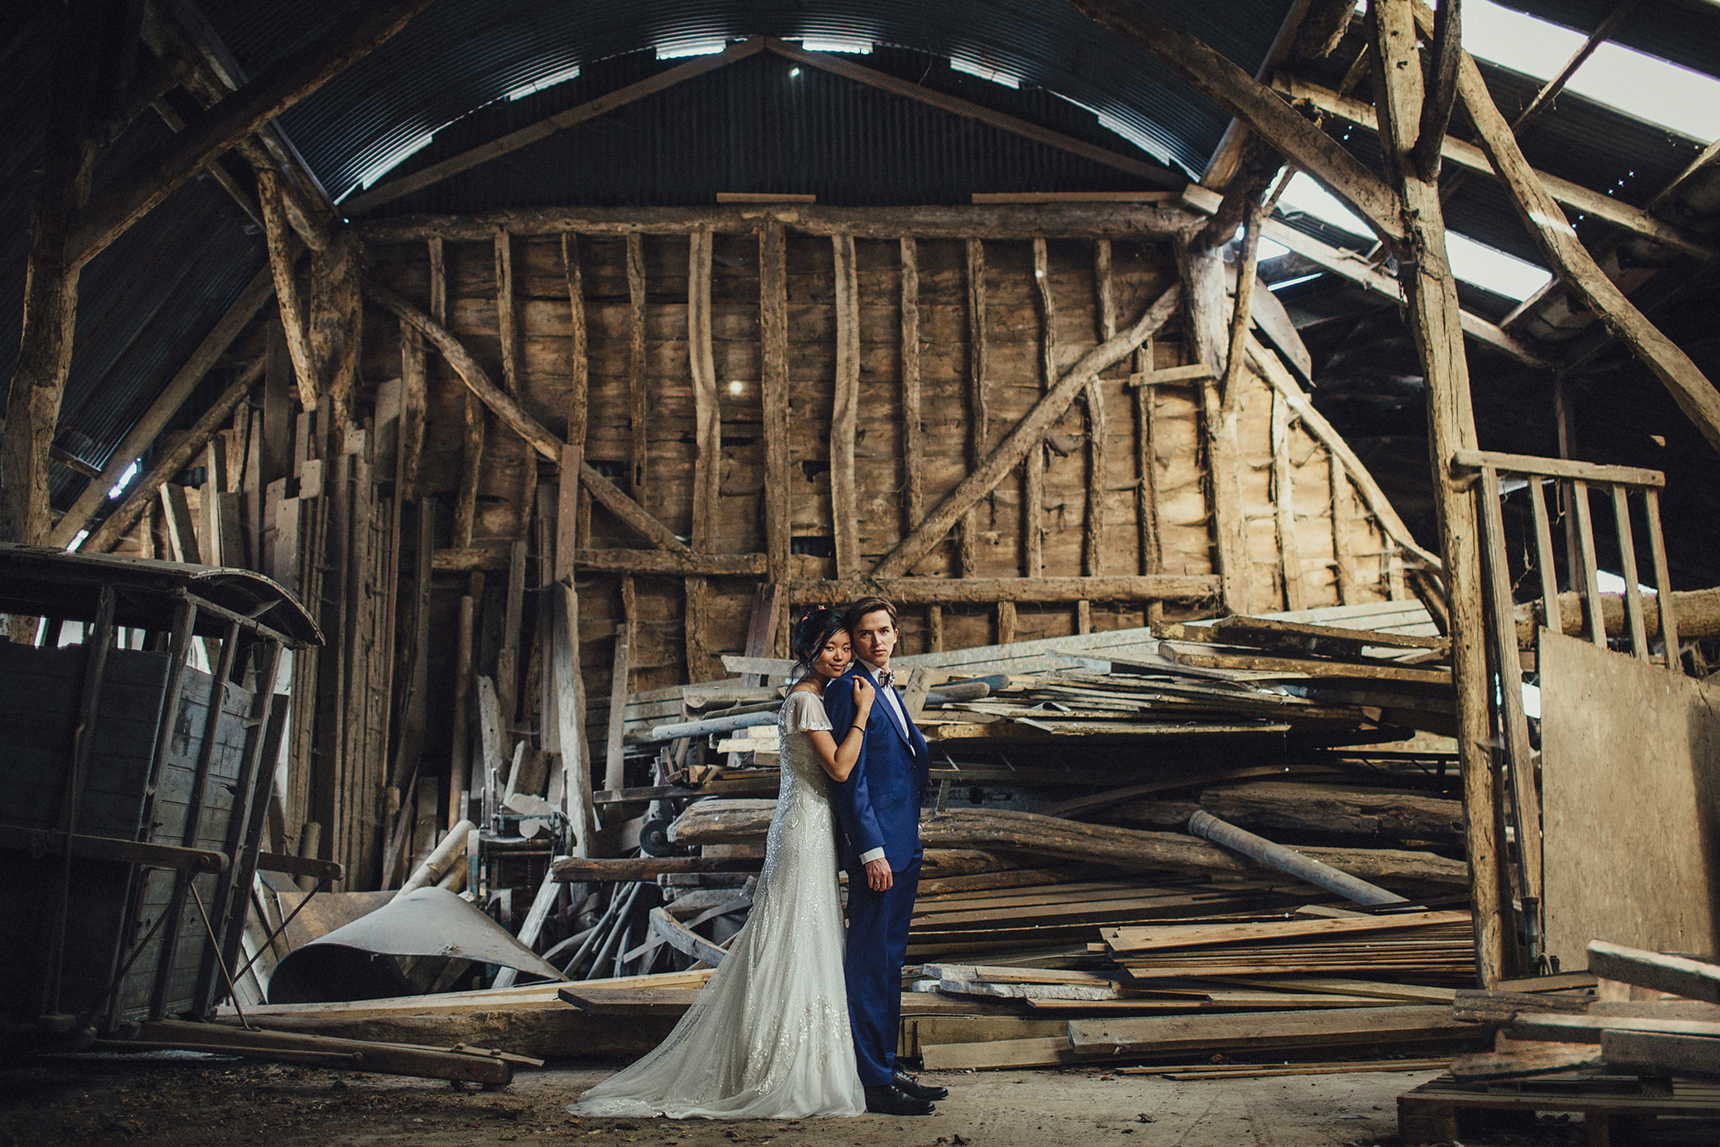 The Manor Barn Harlton weddings